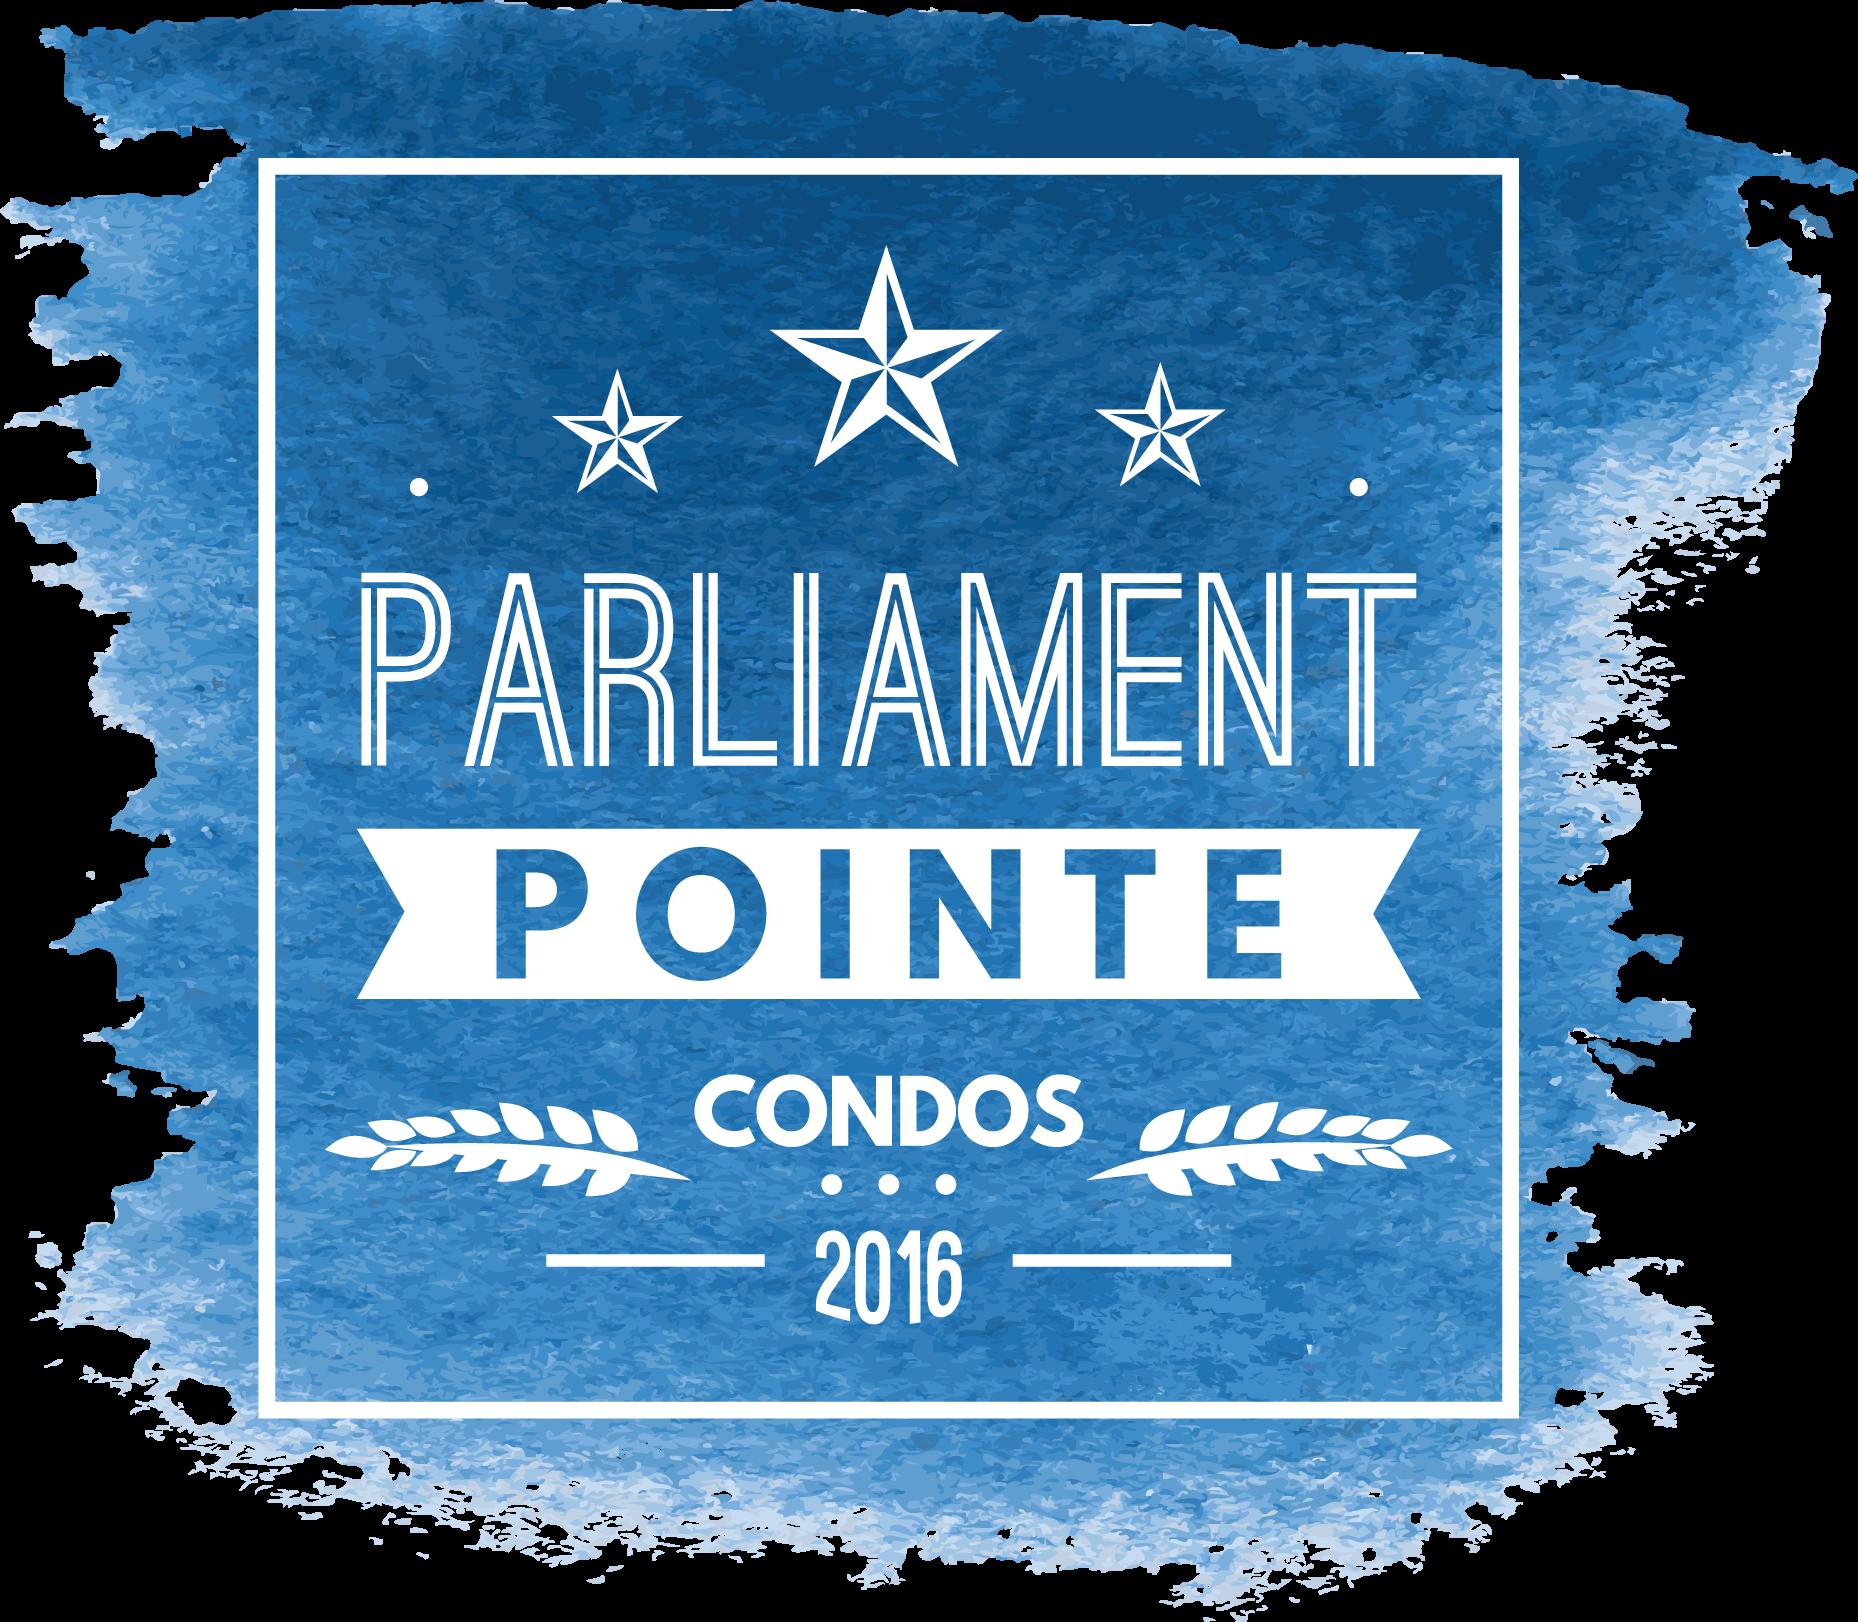 Parliament Pointe